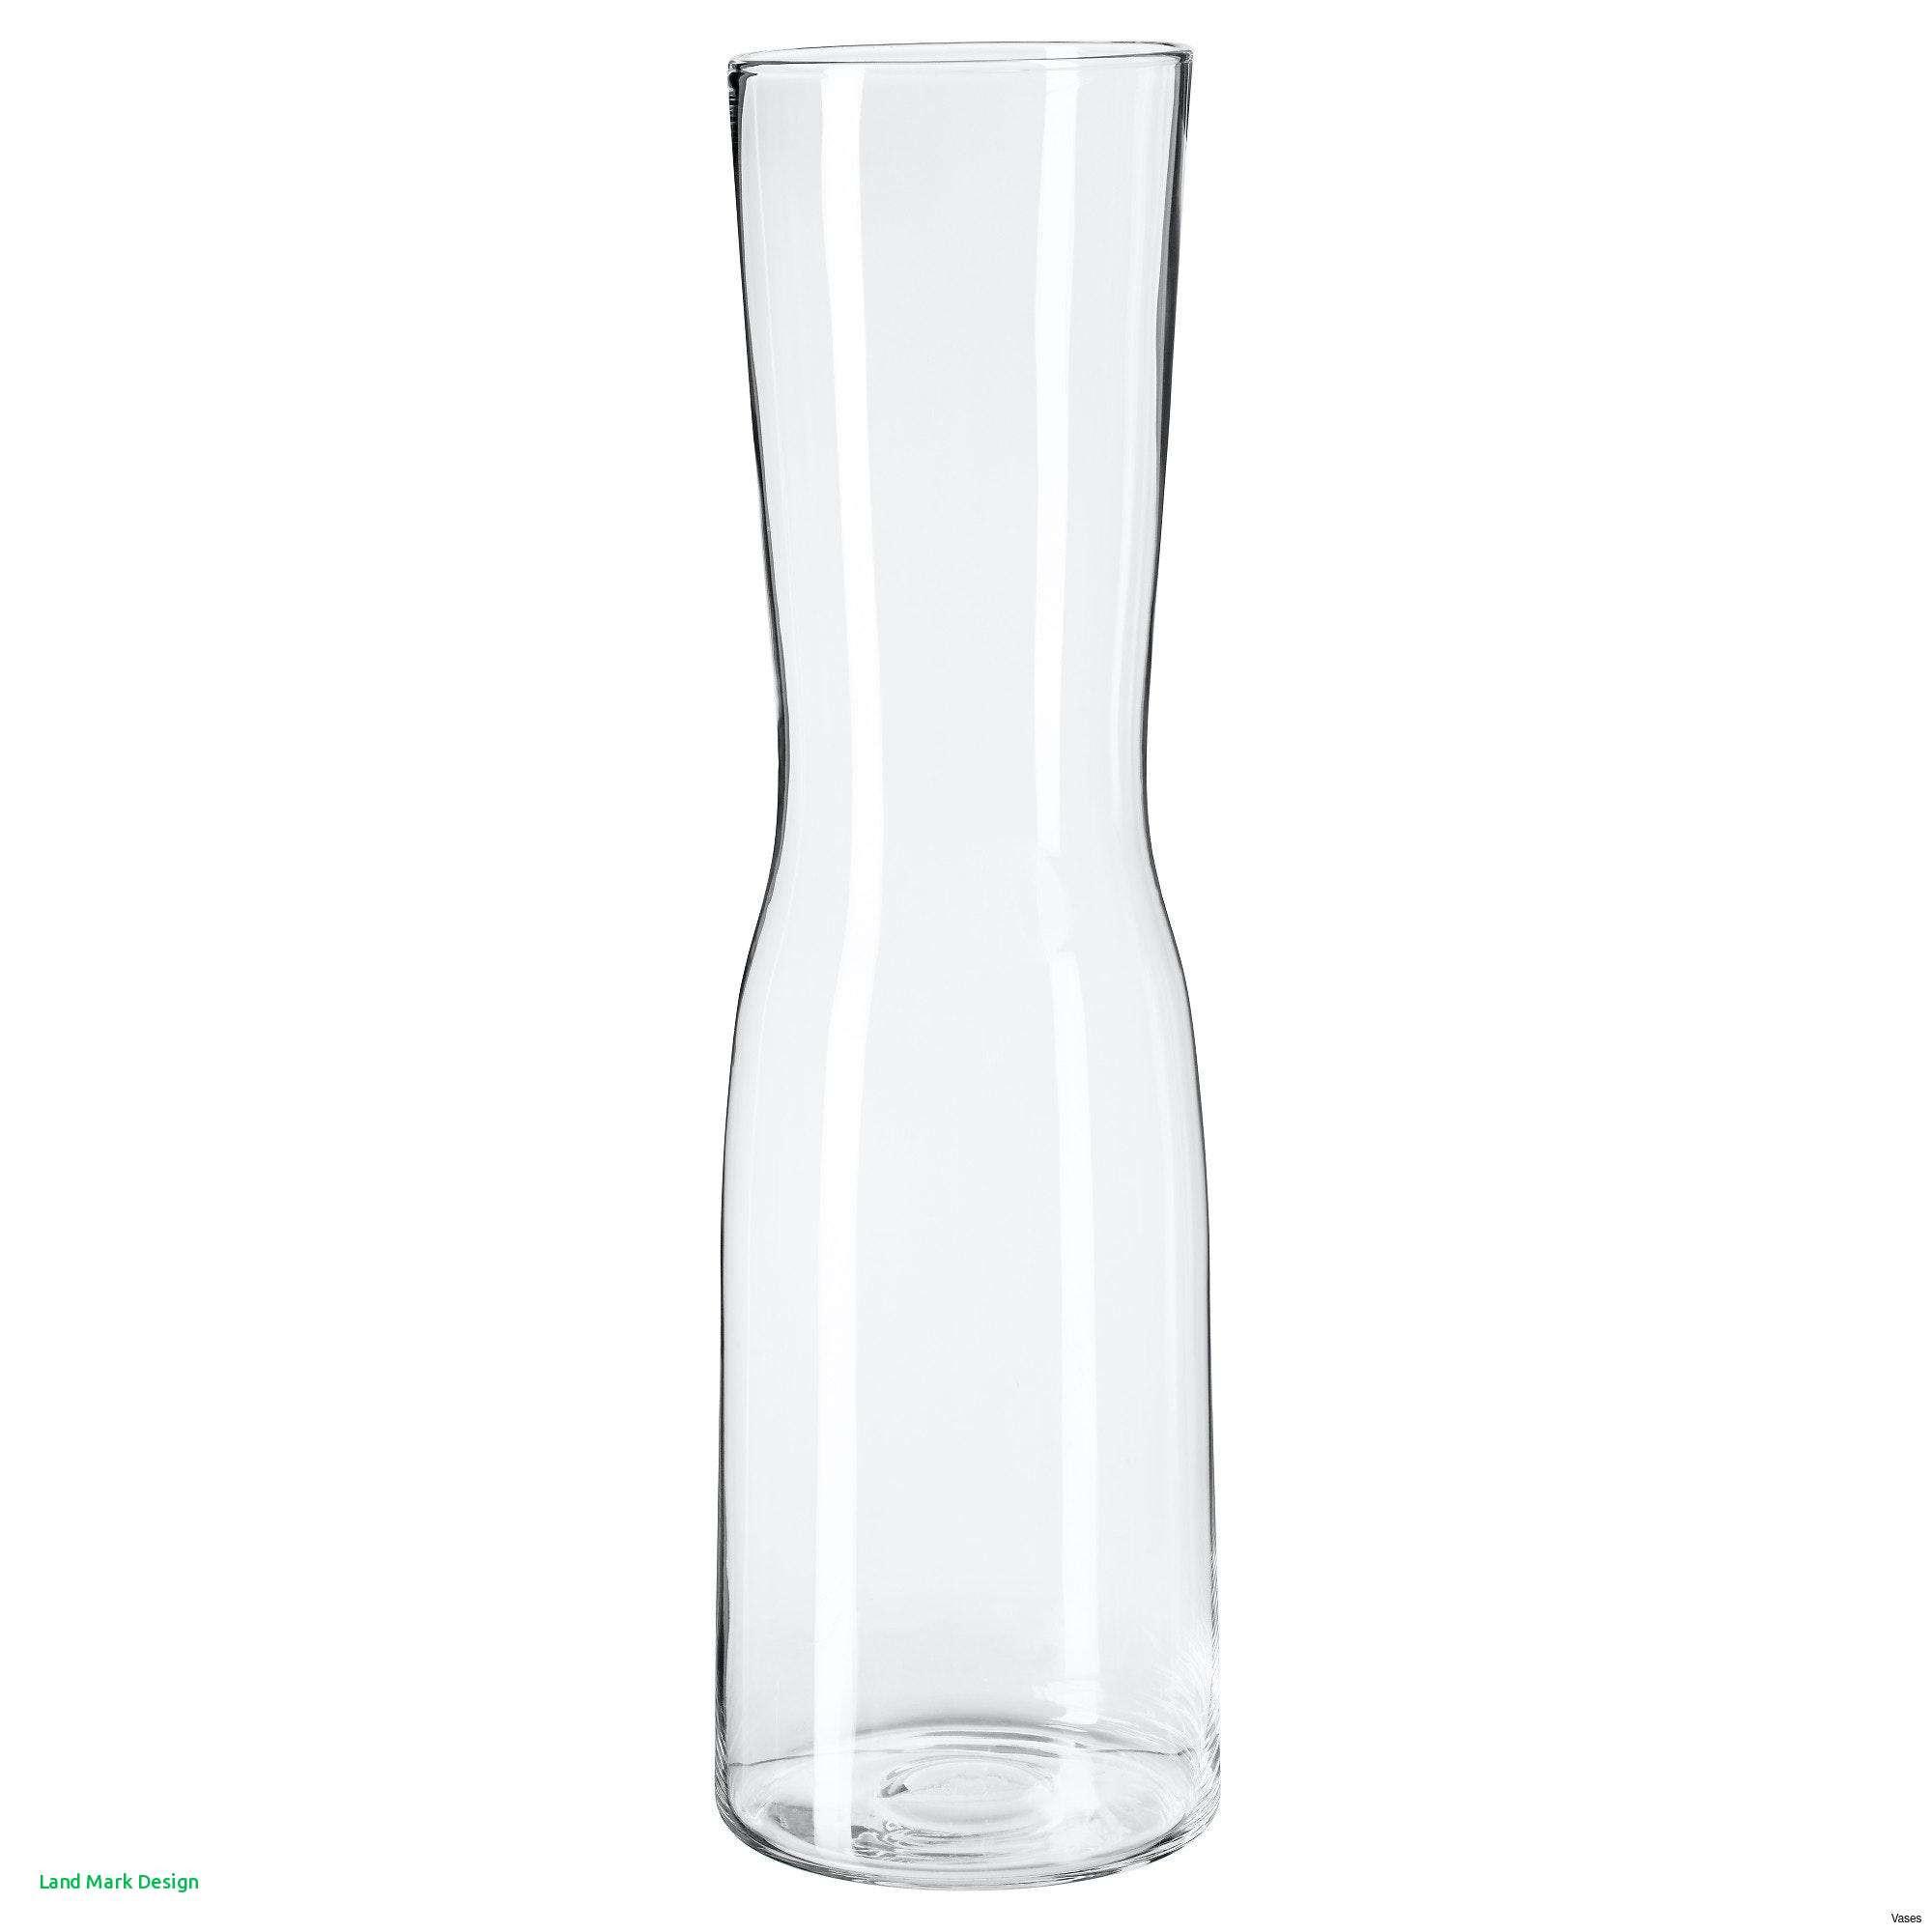 feng shui vase of ikea vase home design pertaining to ikea vase